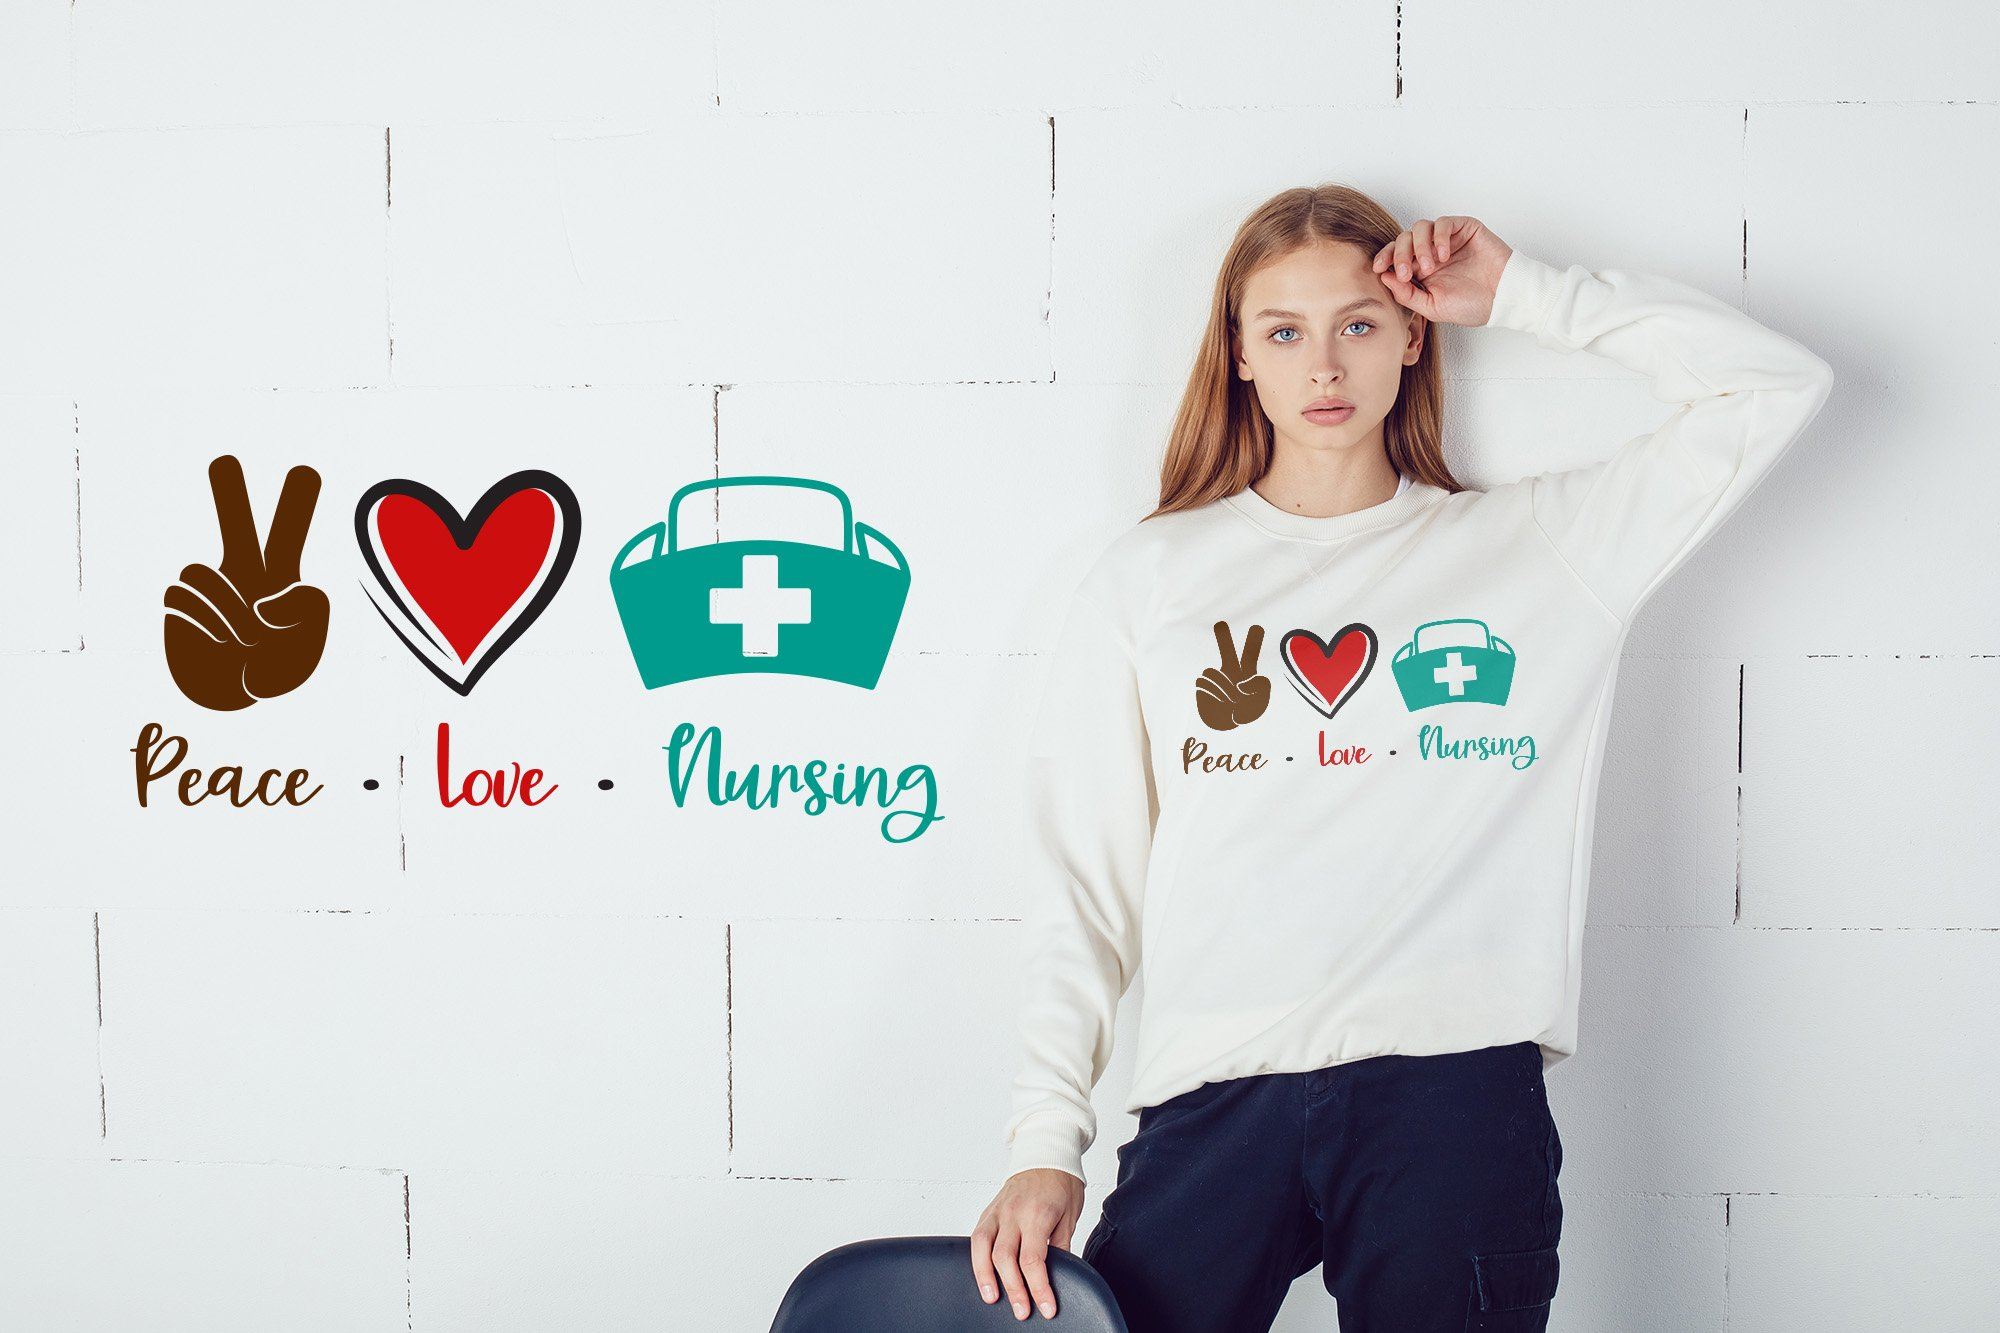 Download Peace Love Nursing Svg Dxf Pdf Eps Png 924388 Cut Files Design Bundles